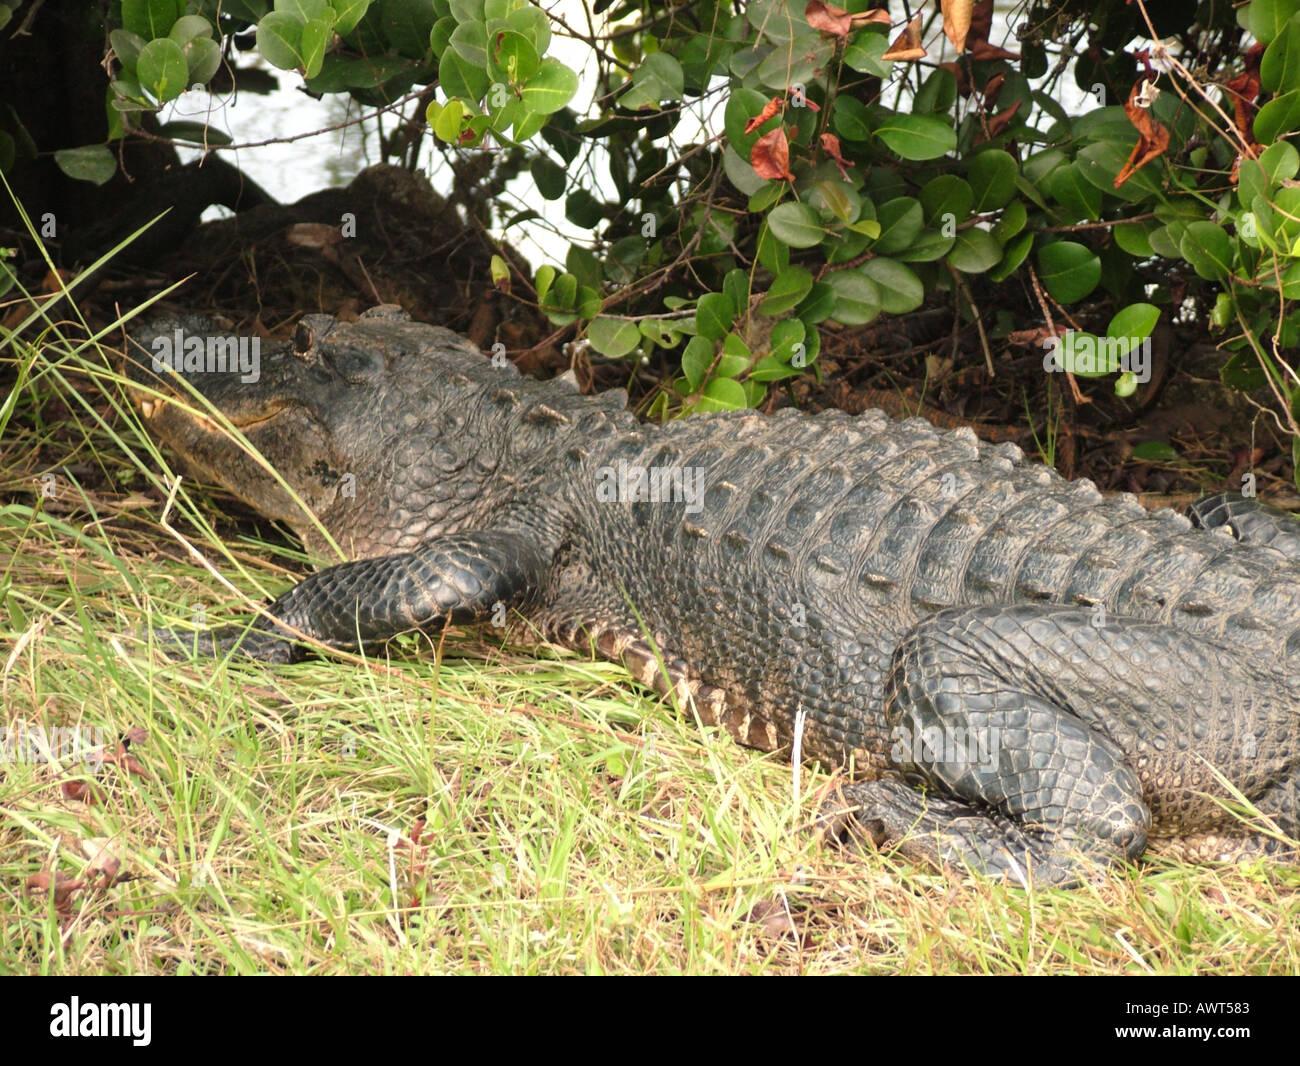 AJD39496, Everglades National Park, FL, Florida Foto Stock